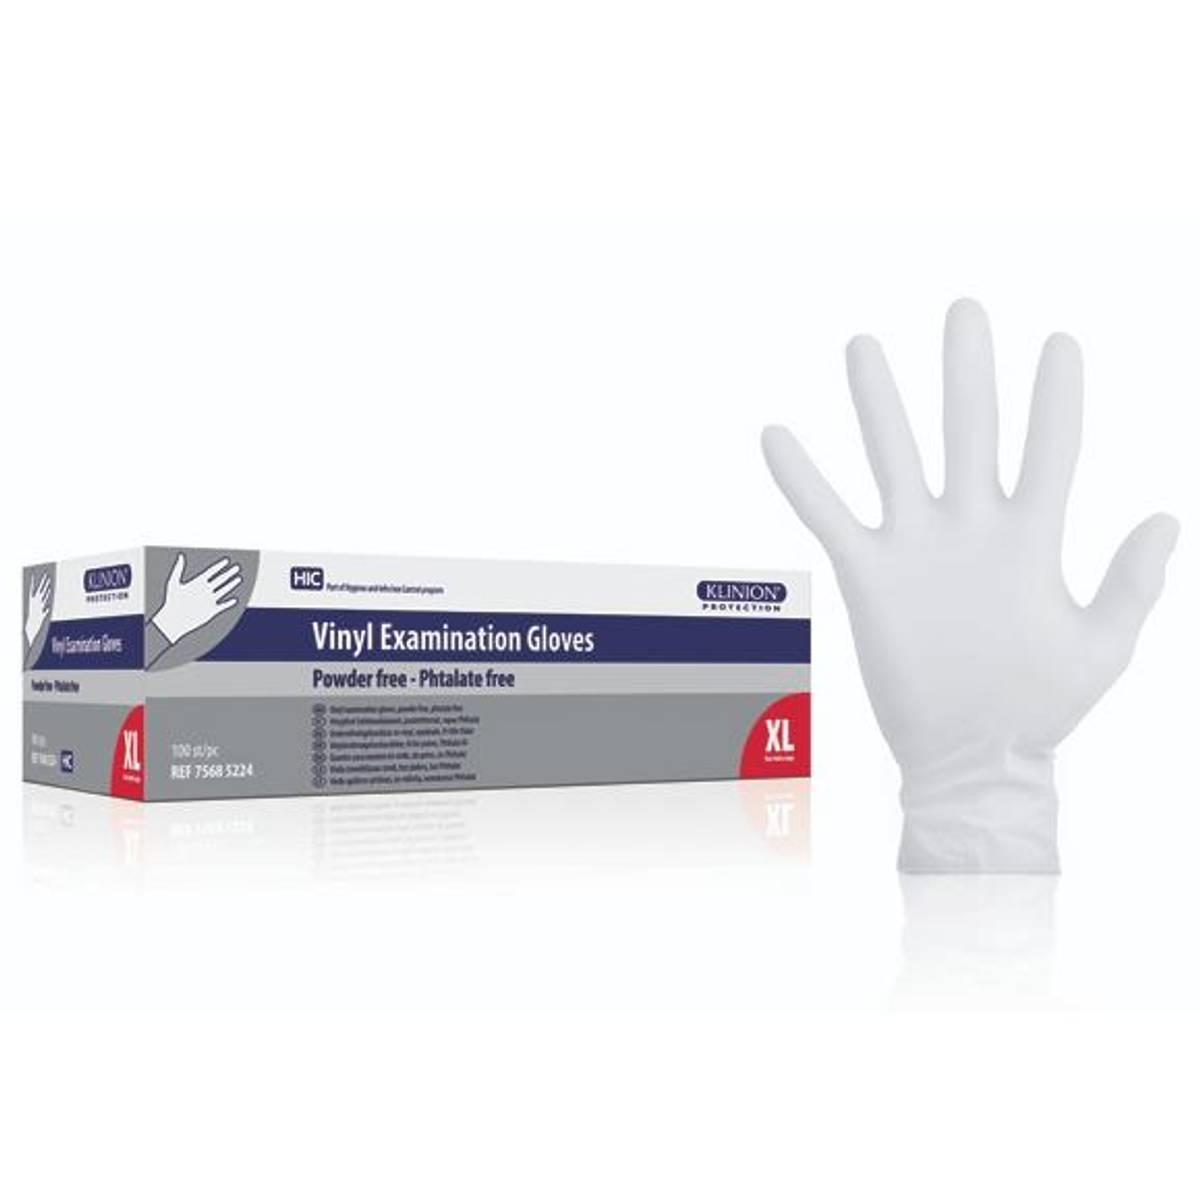 Vinylhanske Klinion Ftalatfri u/pudder XL